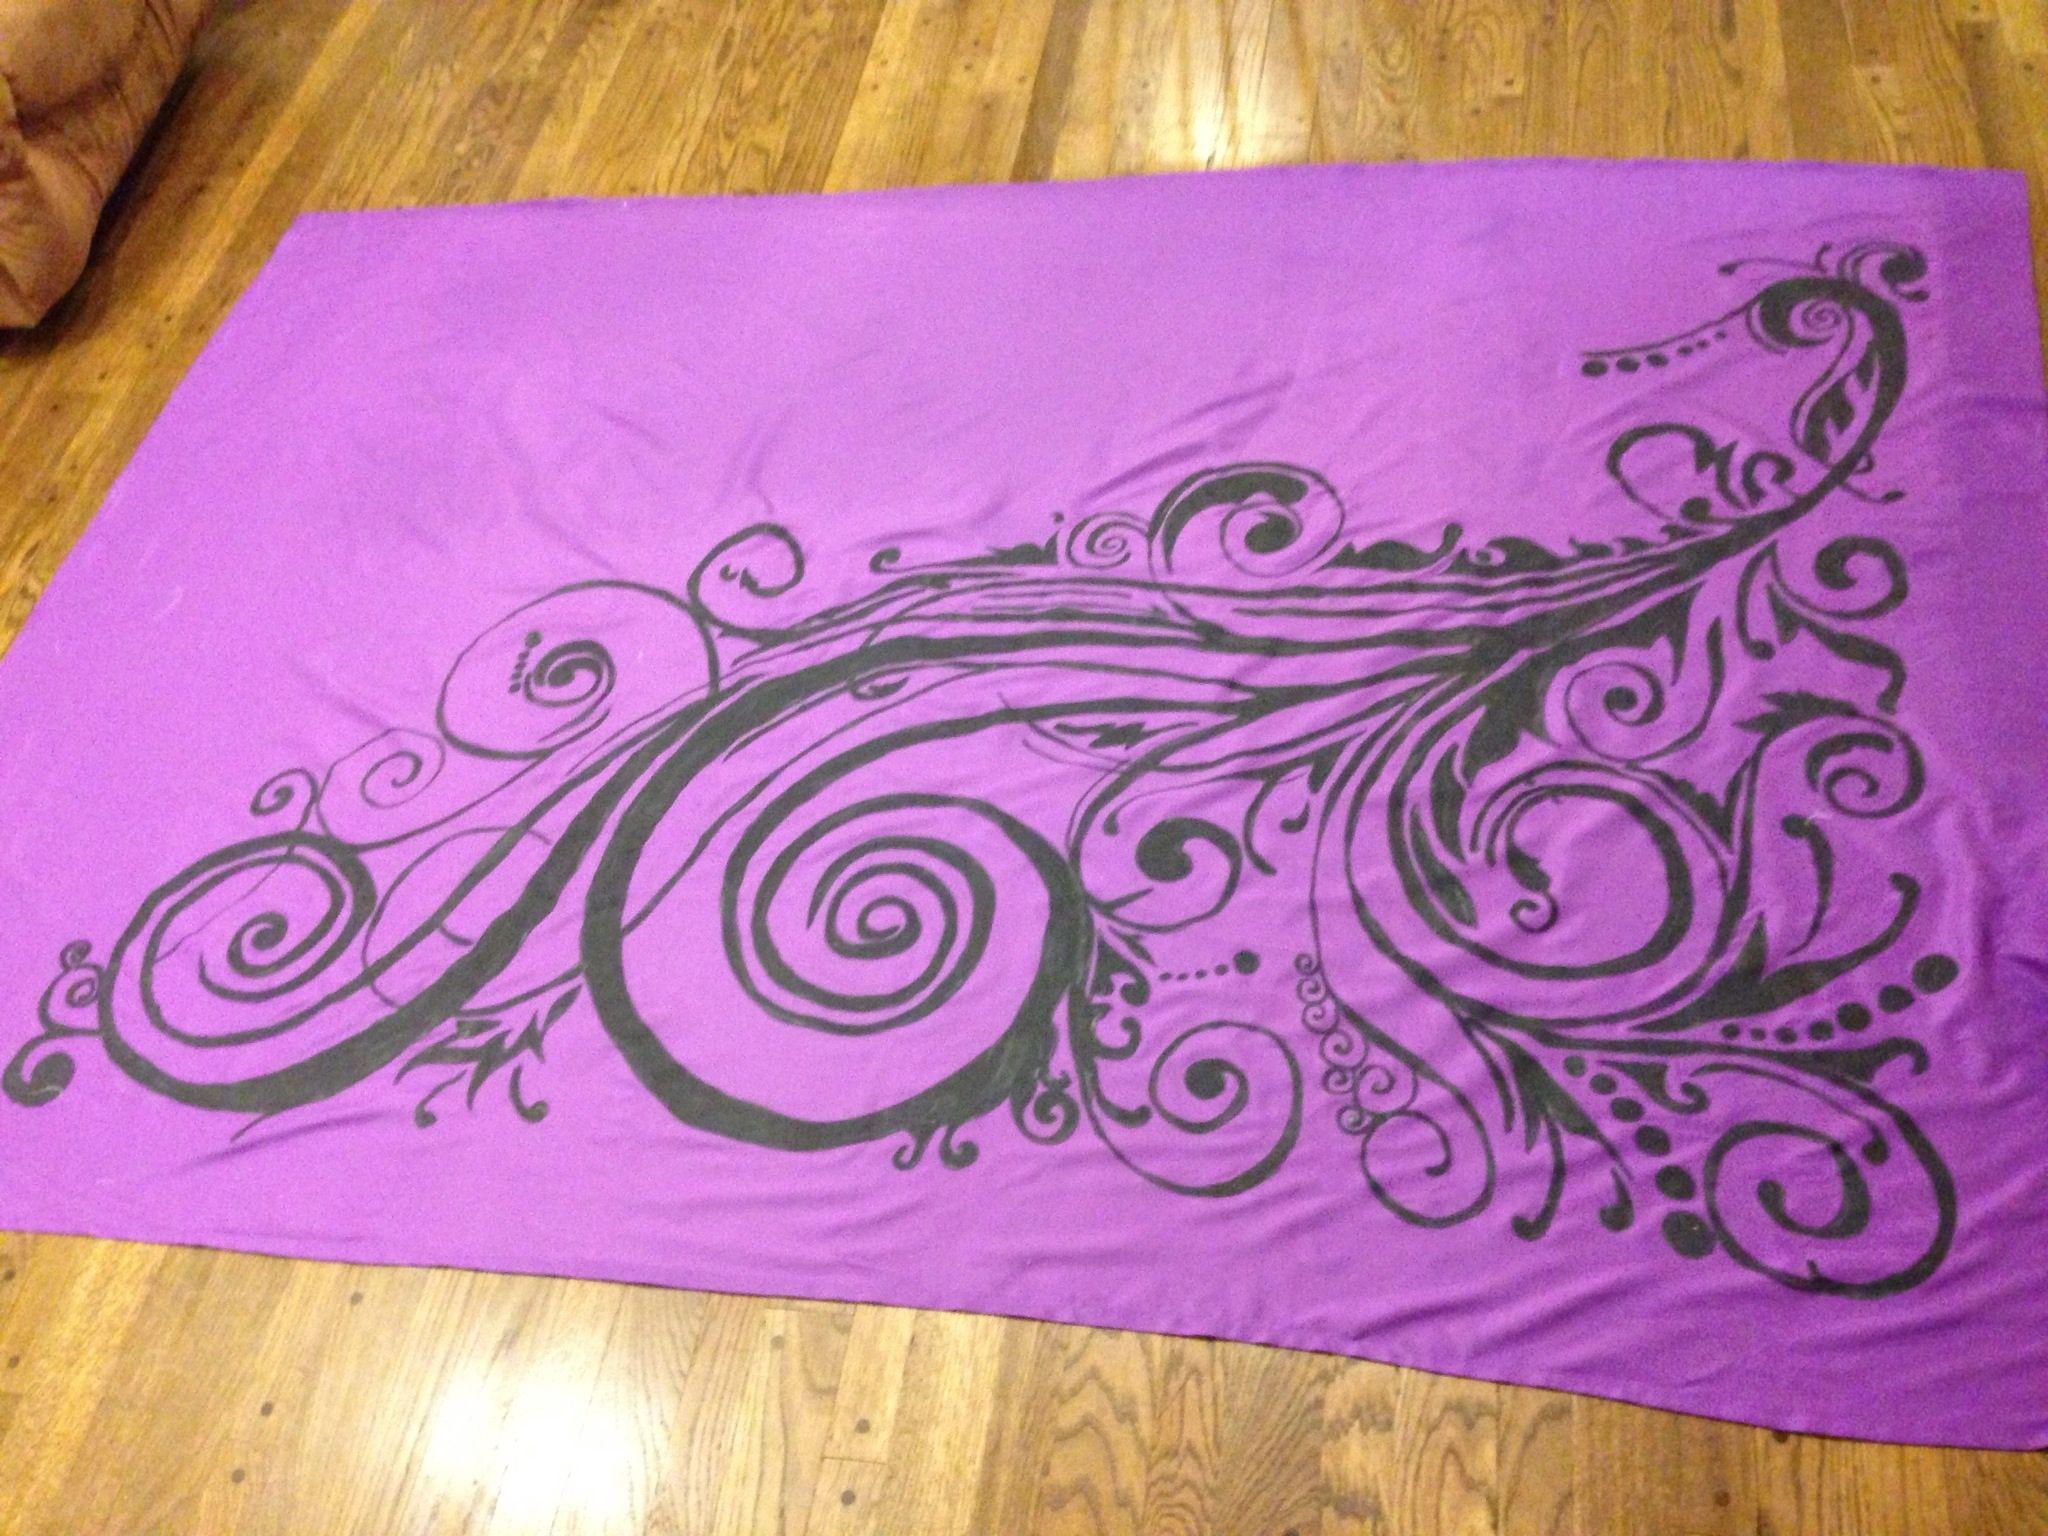 Fabric Painting Curtains Bbcbdfebddb